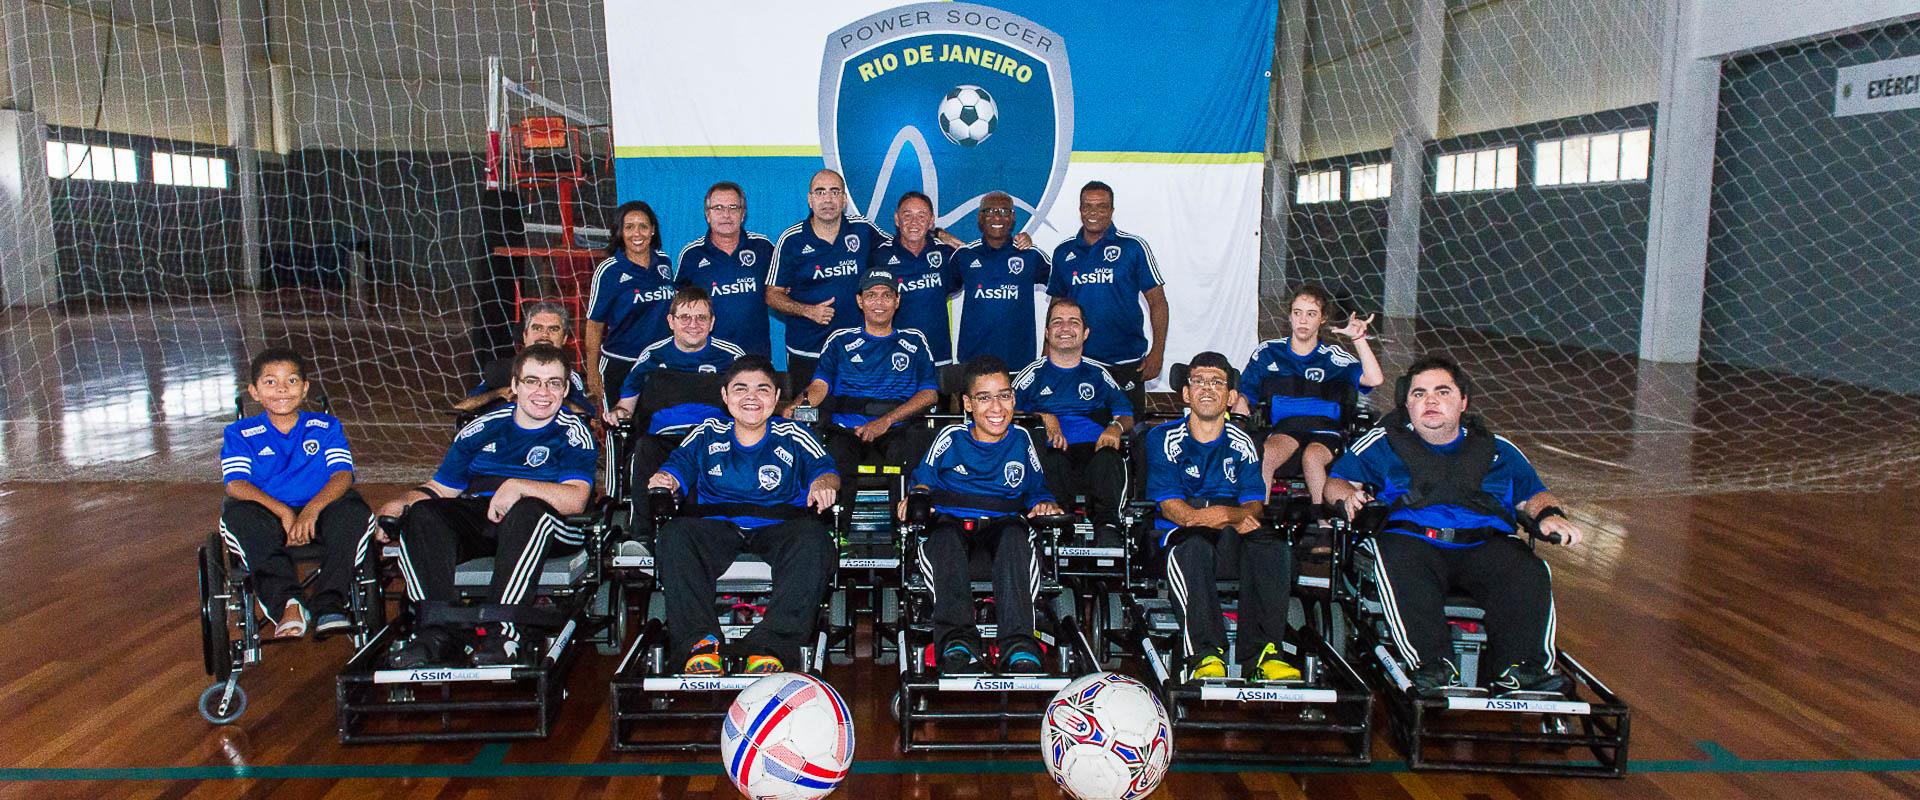 Rio de Janeiro Power Soccer Clube